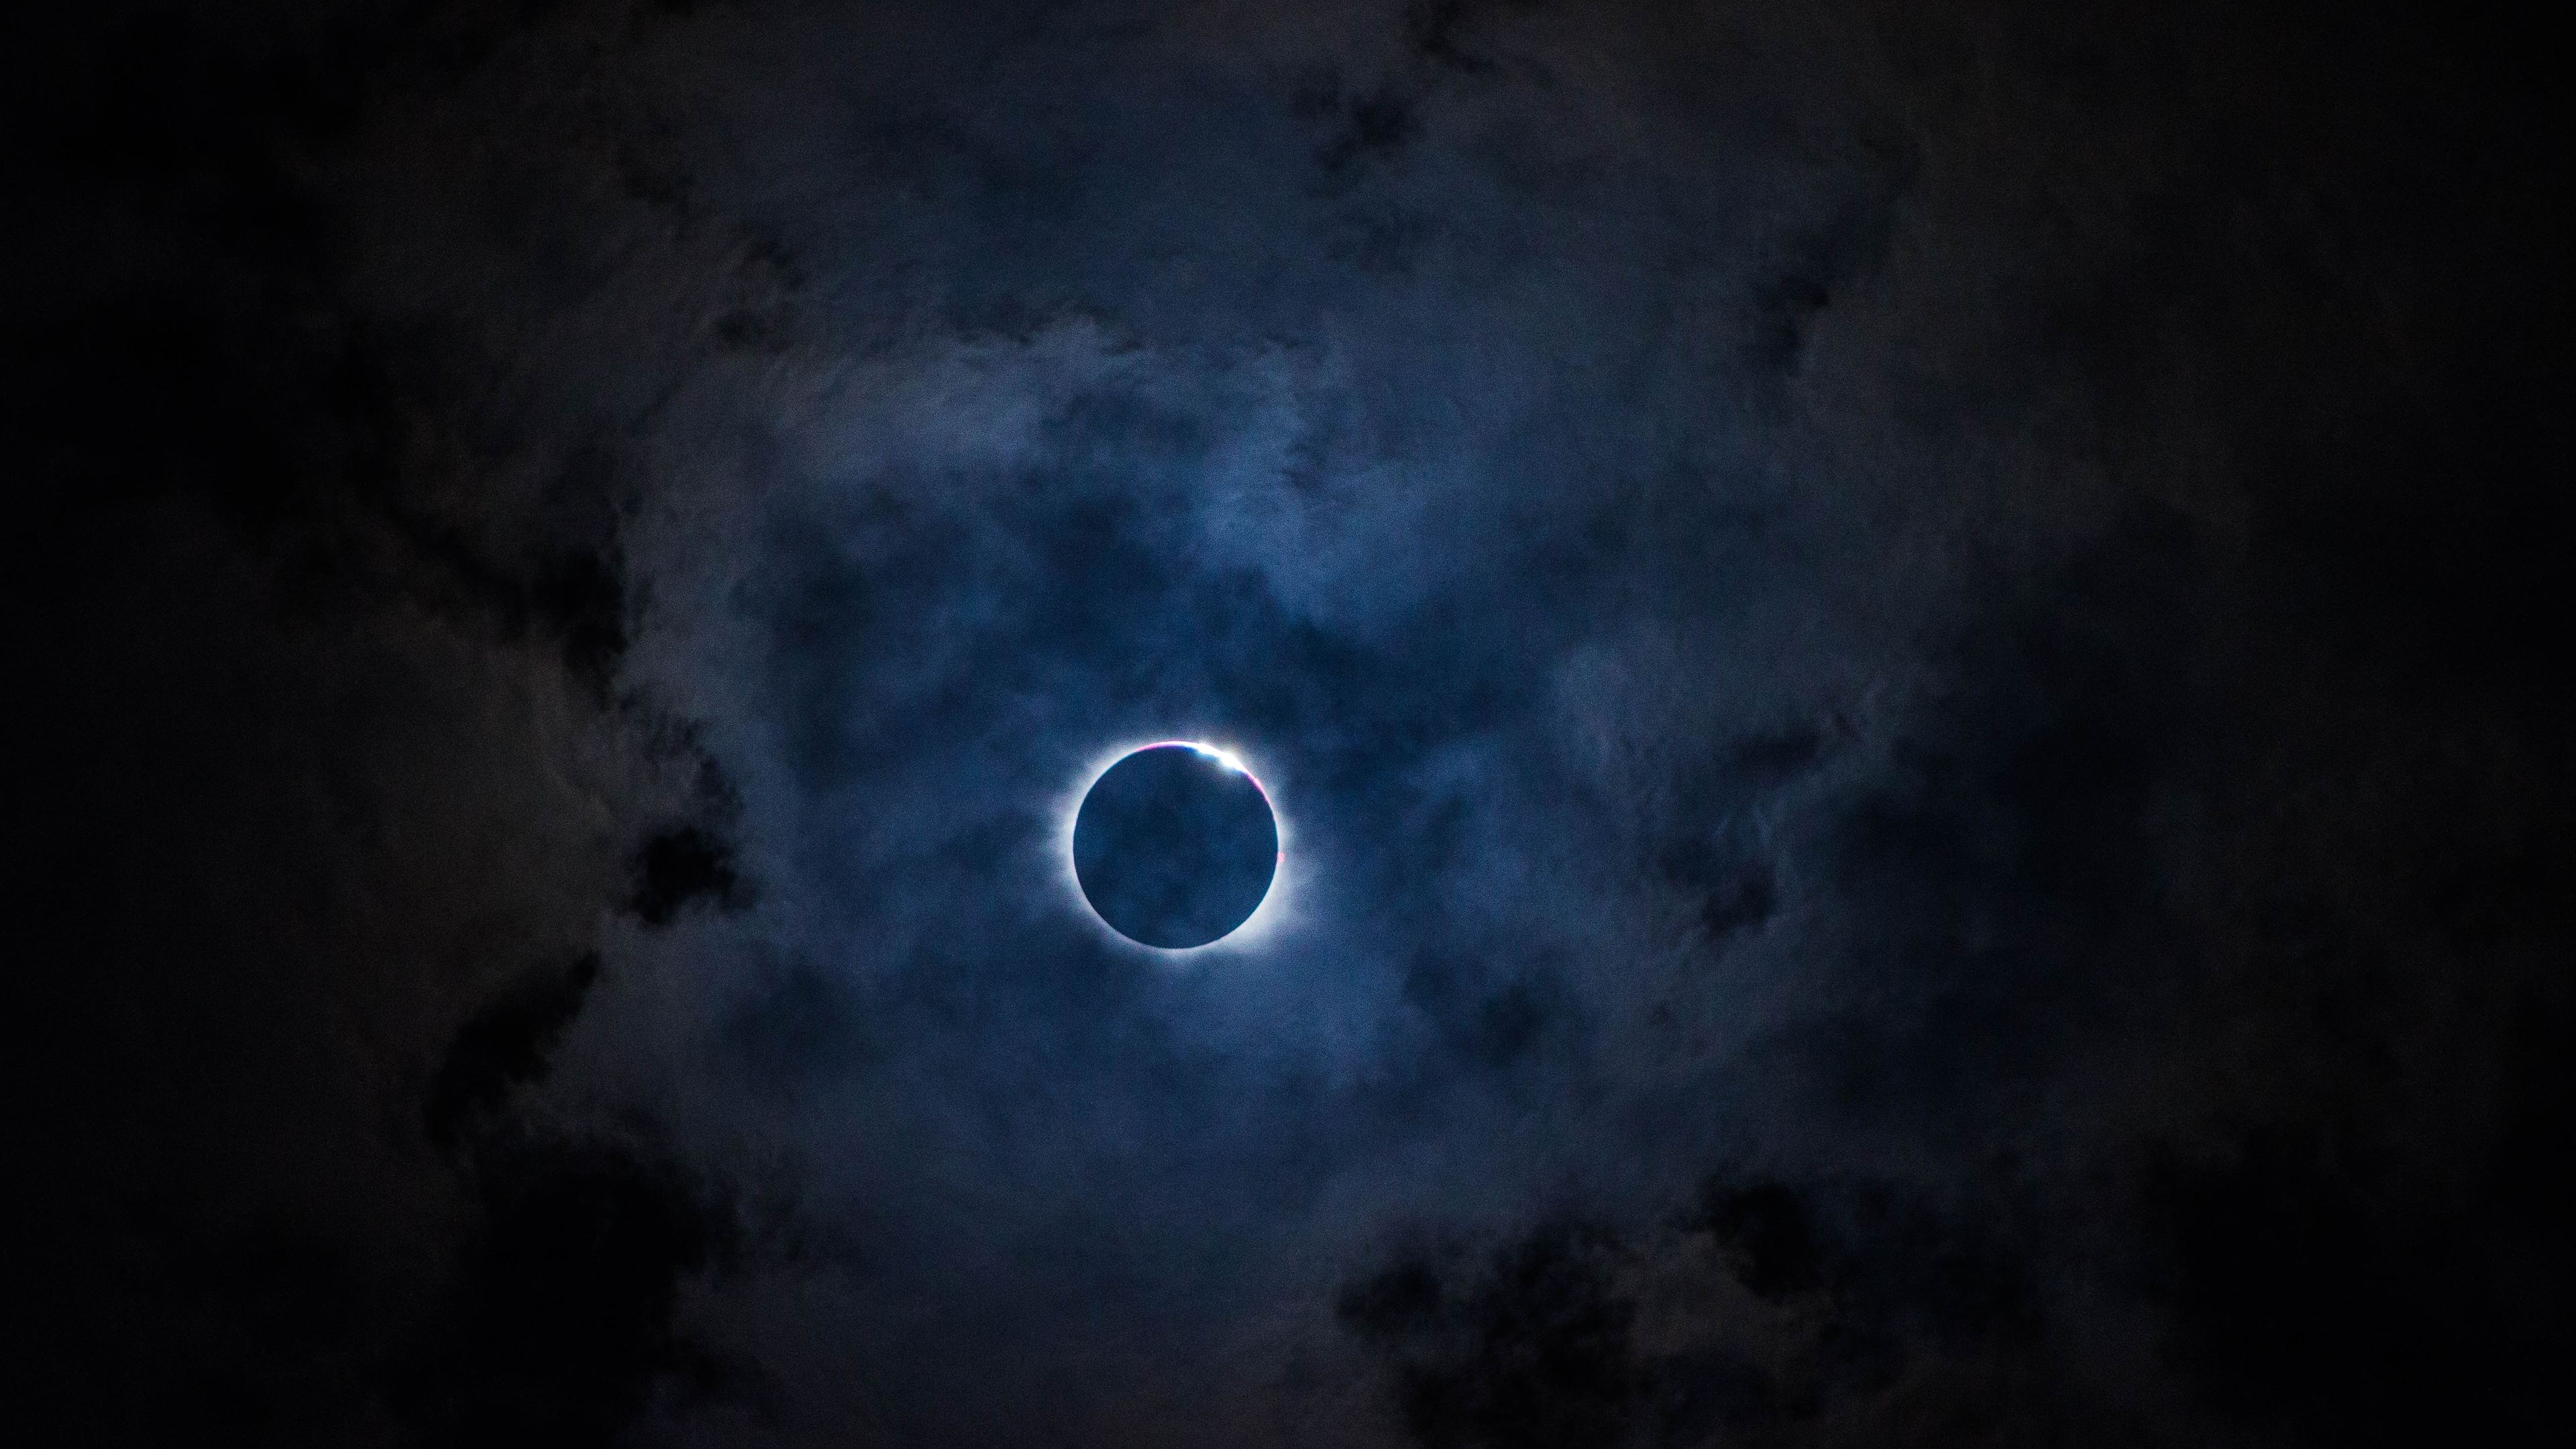 solar eclipse 4k 1540142886 - Solar Eclipse 4k - nature wallpapers, hd-wallpapers, eclipse wallpapers, 5k wallpapers, 4k-wallpapers